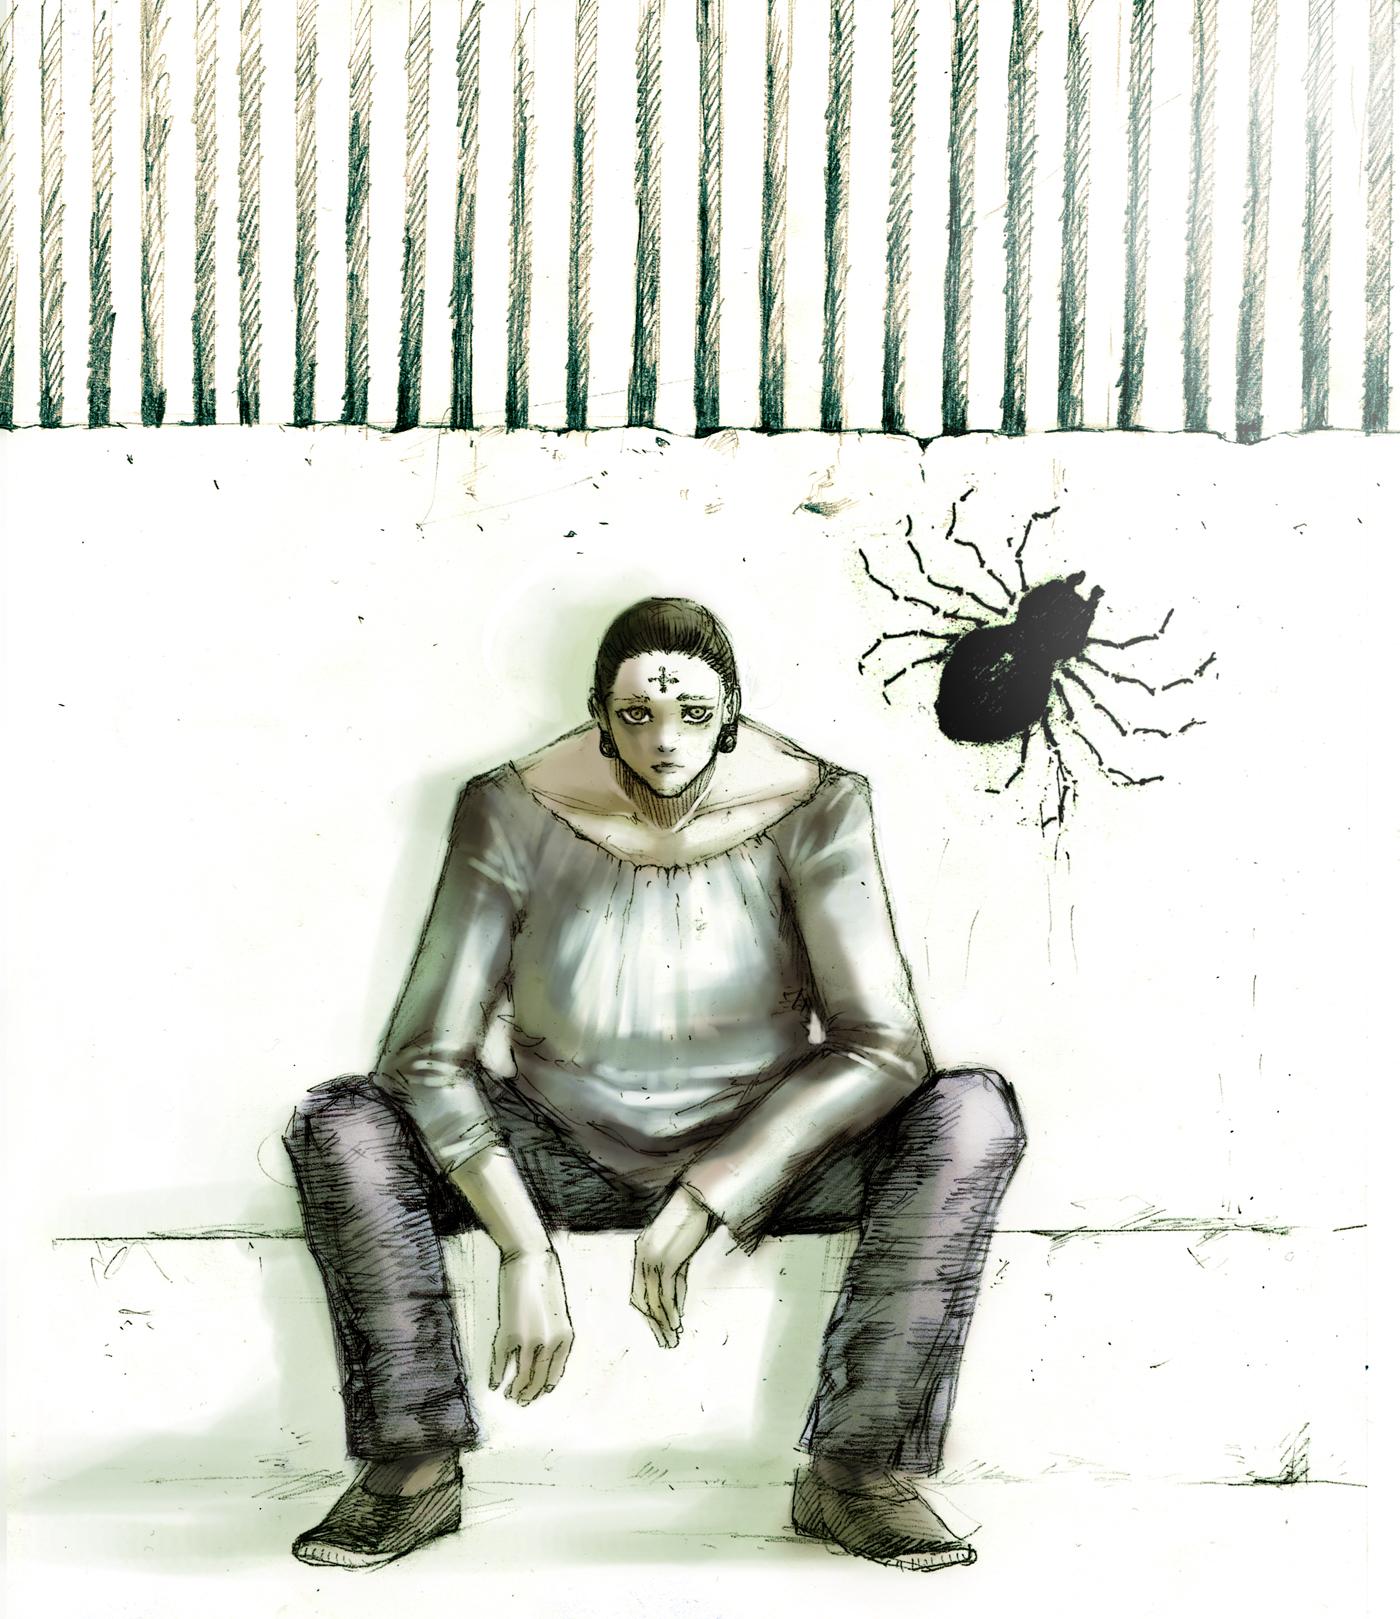 Chrollo Lucifer/#897071